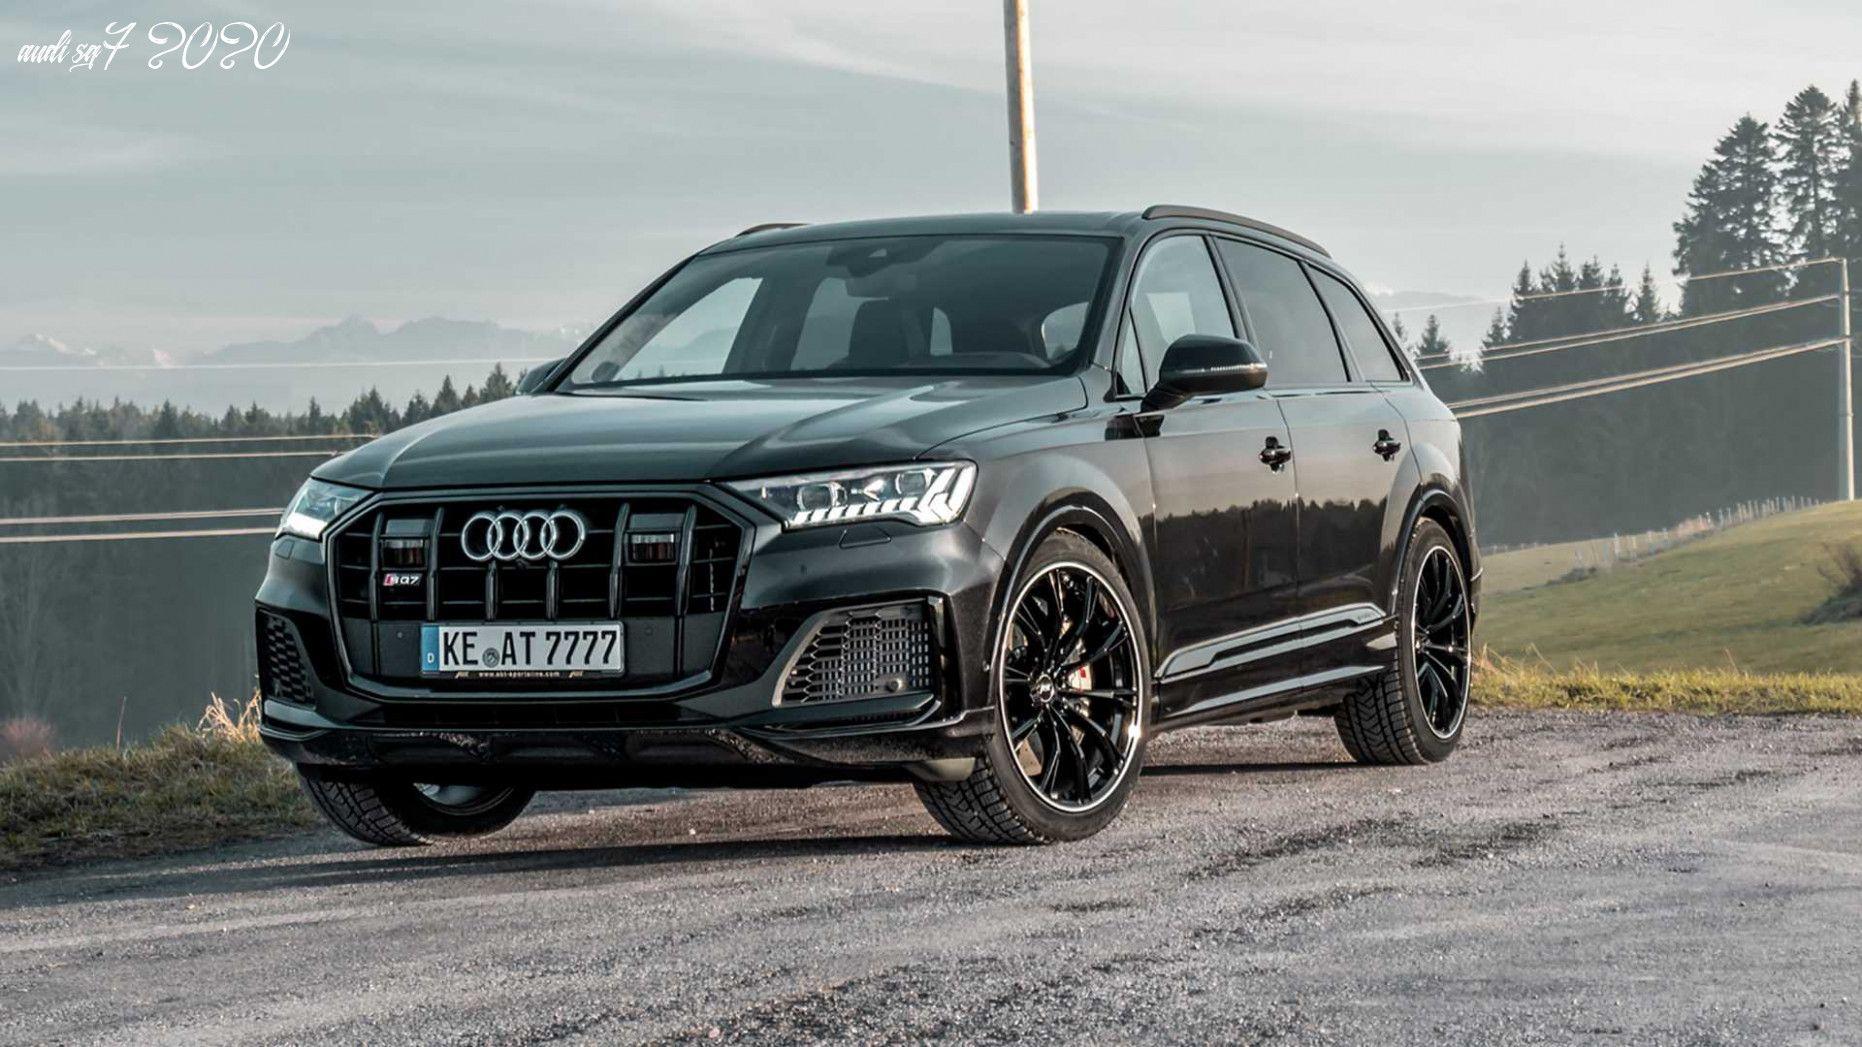 Audi Sq7 2020 In 2020 Audi Audi Dealership Car